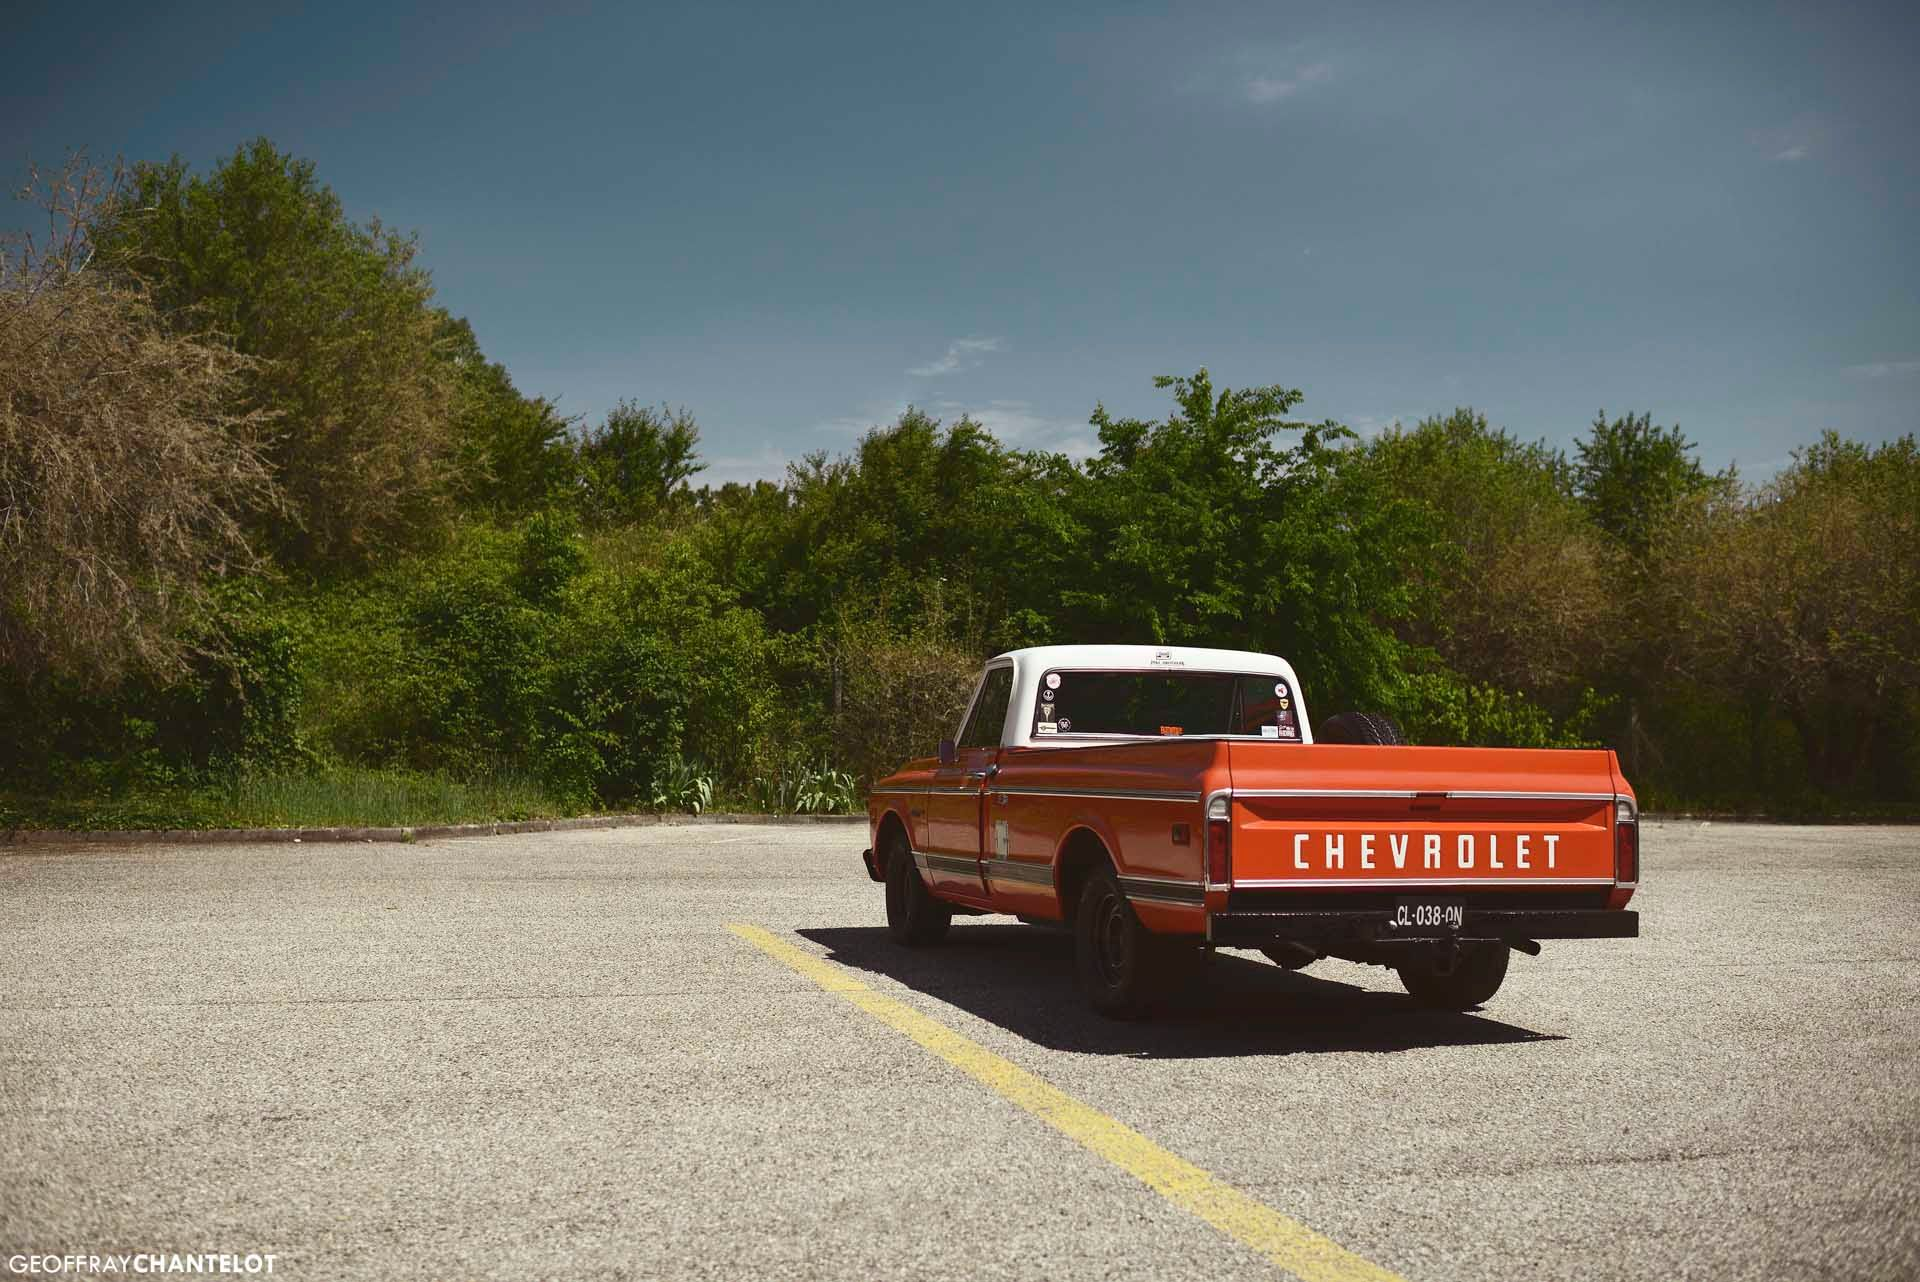 Chevrolet 8400